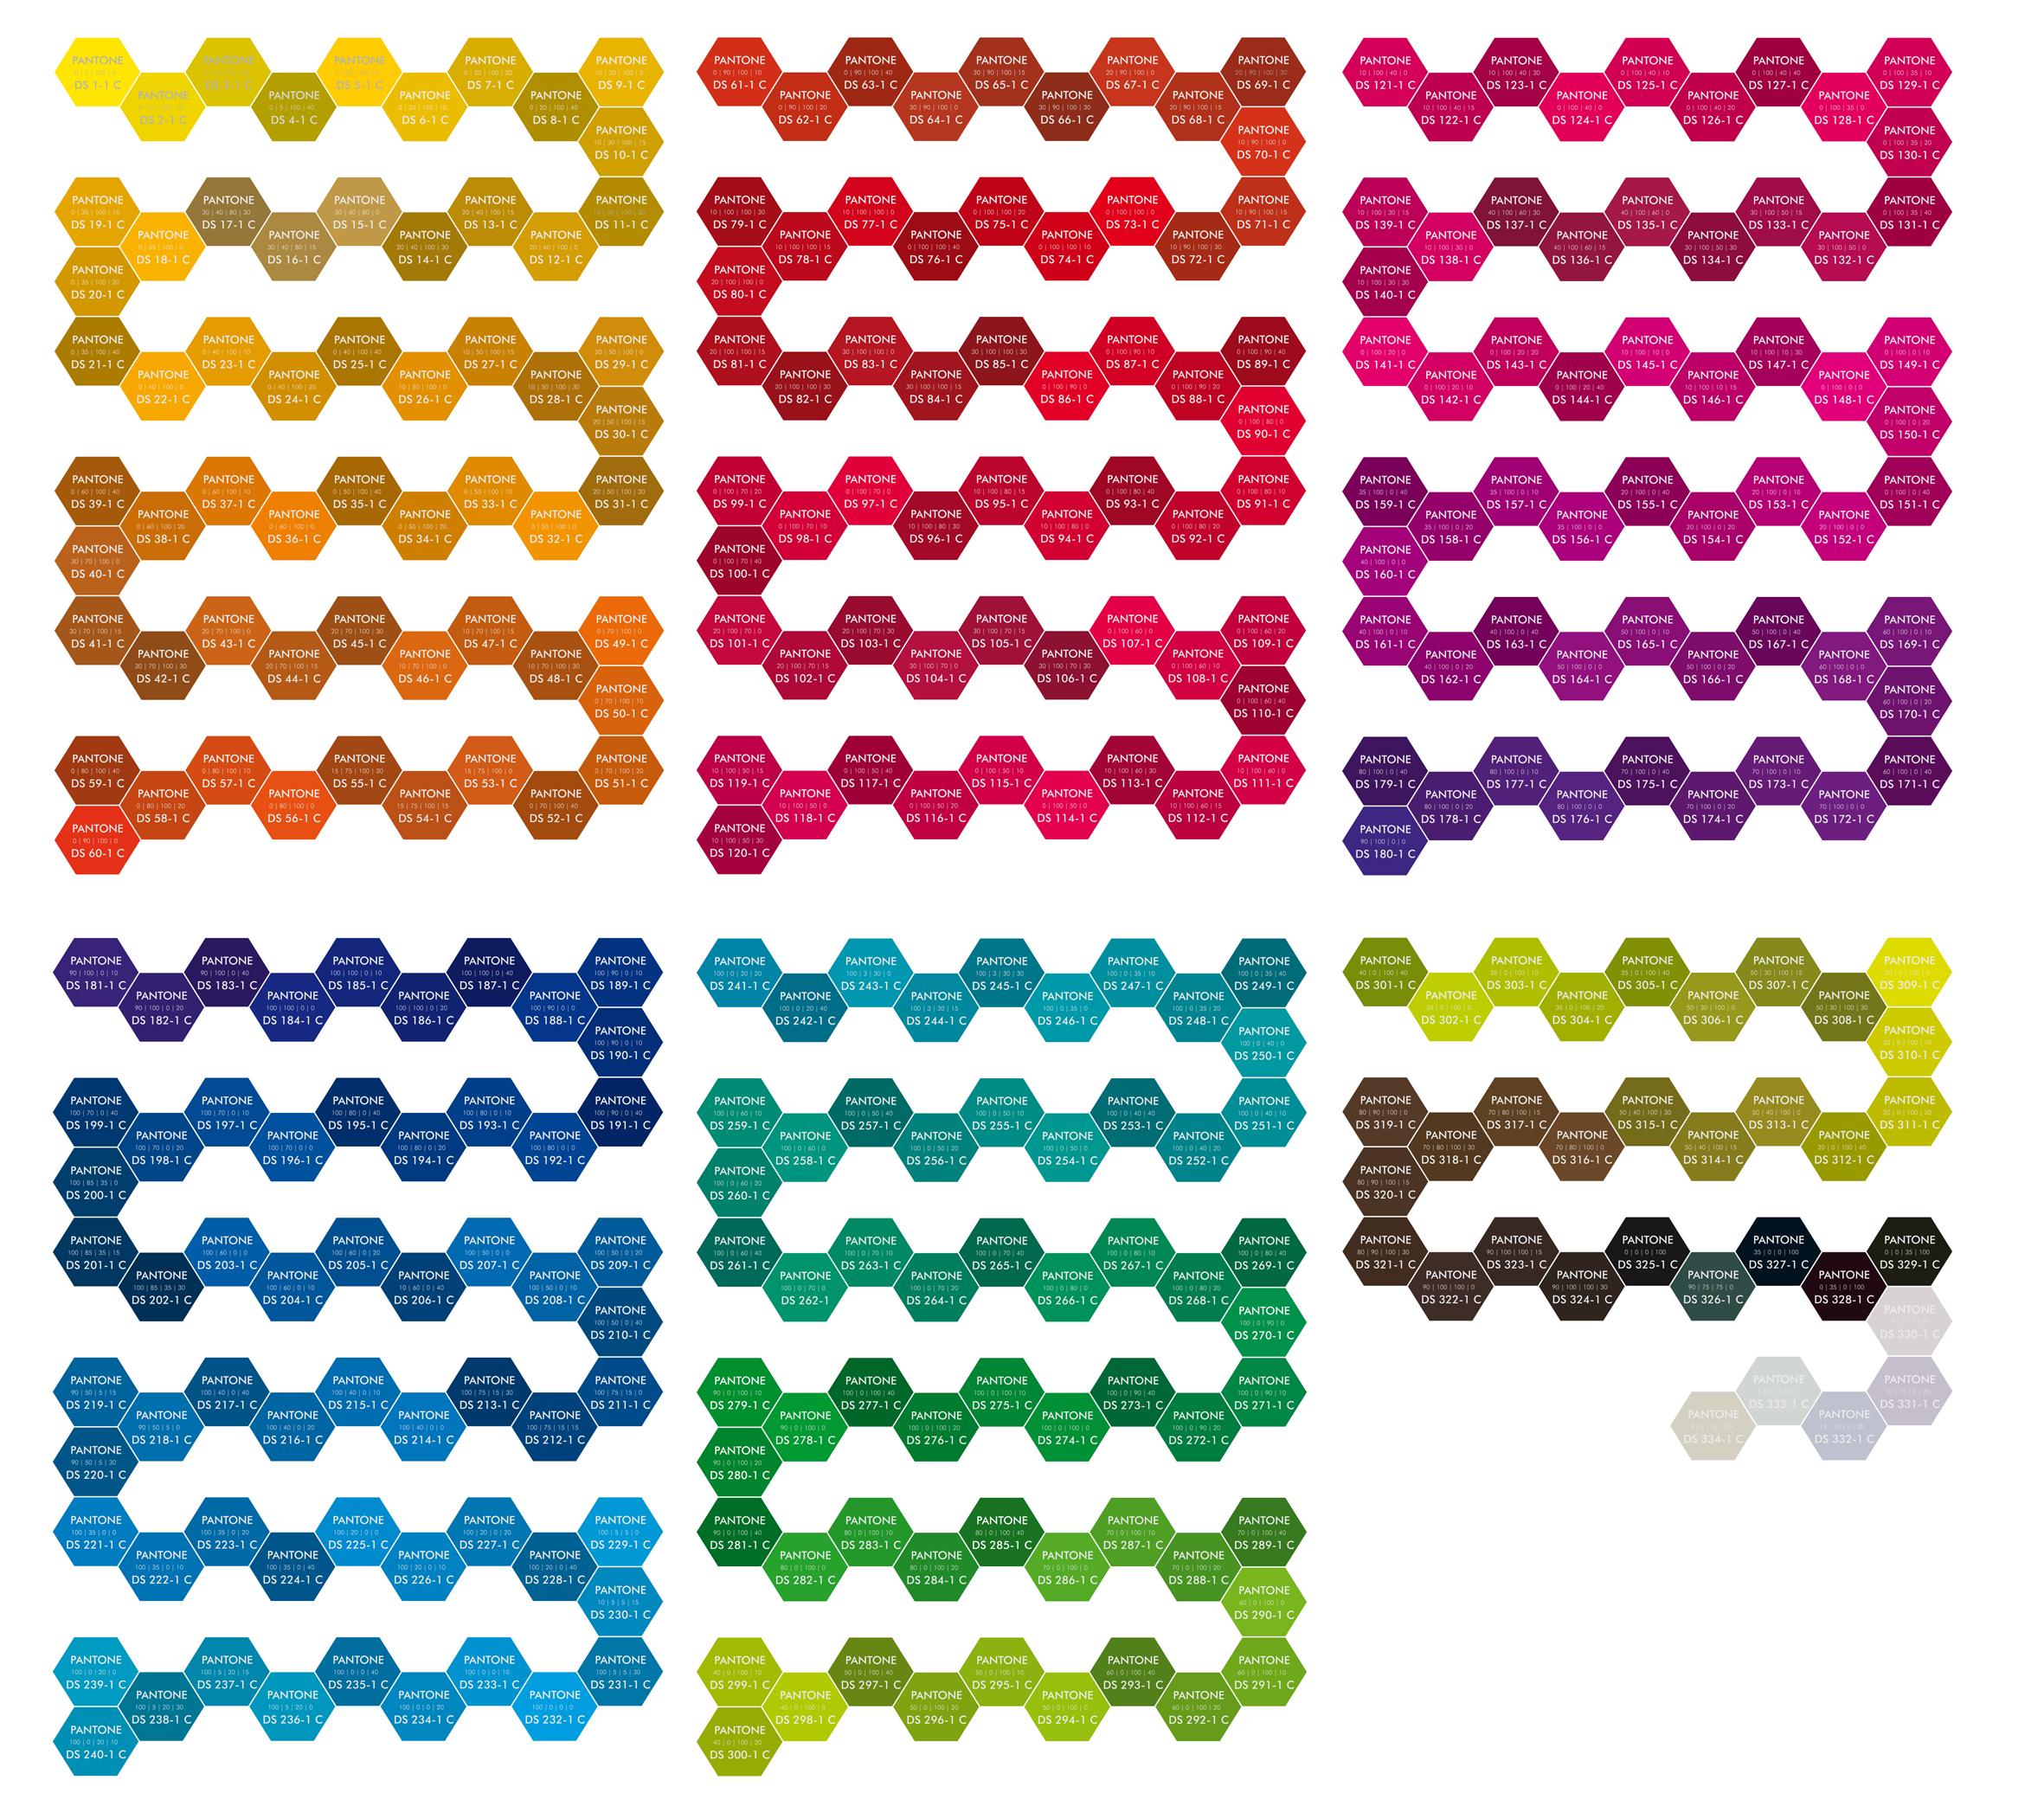 werbeagentur karlsruhe informiert ber farben in der werbung werbeagentur karlsruhe martes new. Black Bedroom Furniture Sets. Home Design Ideas